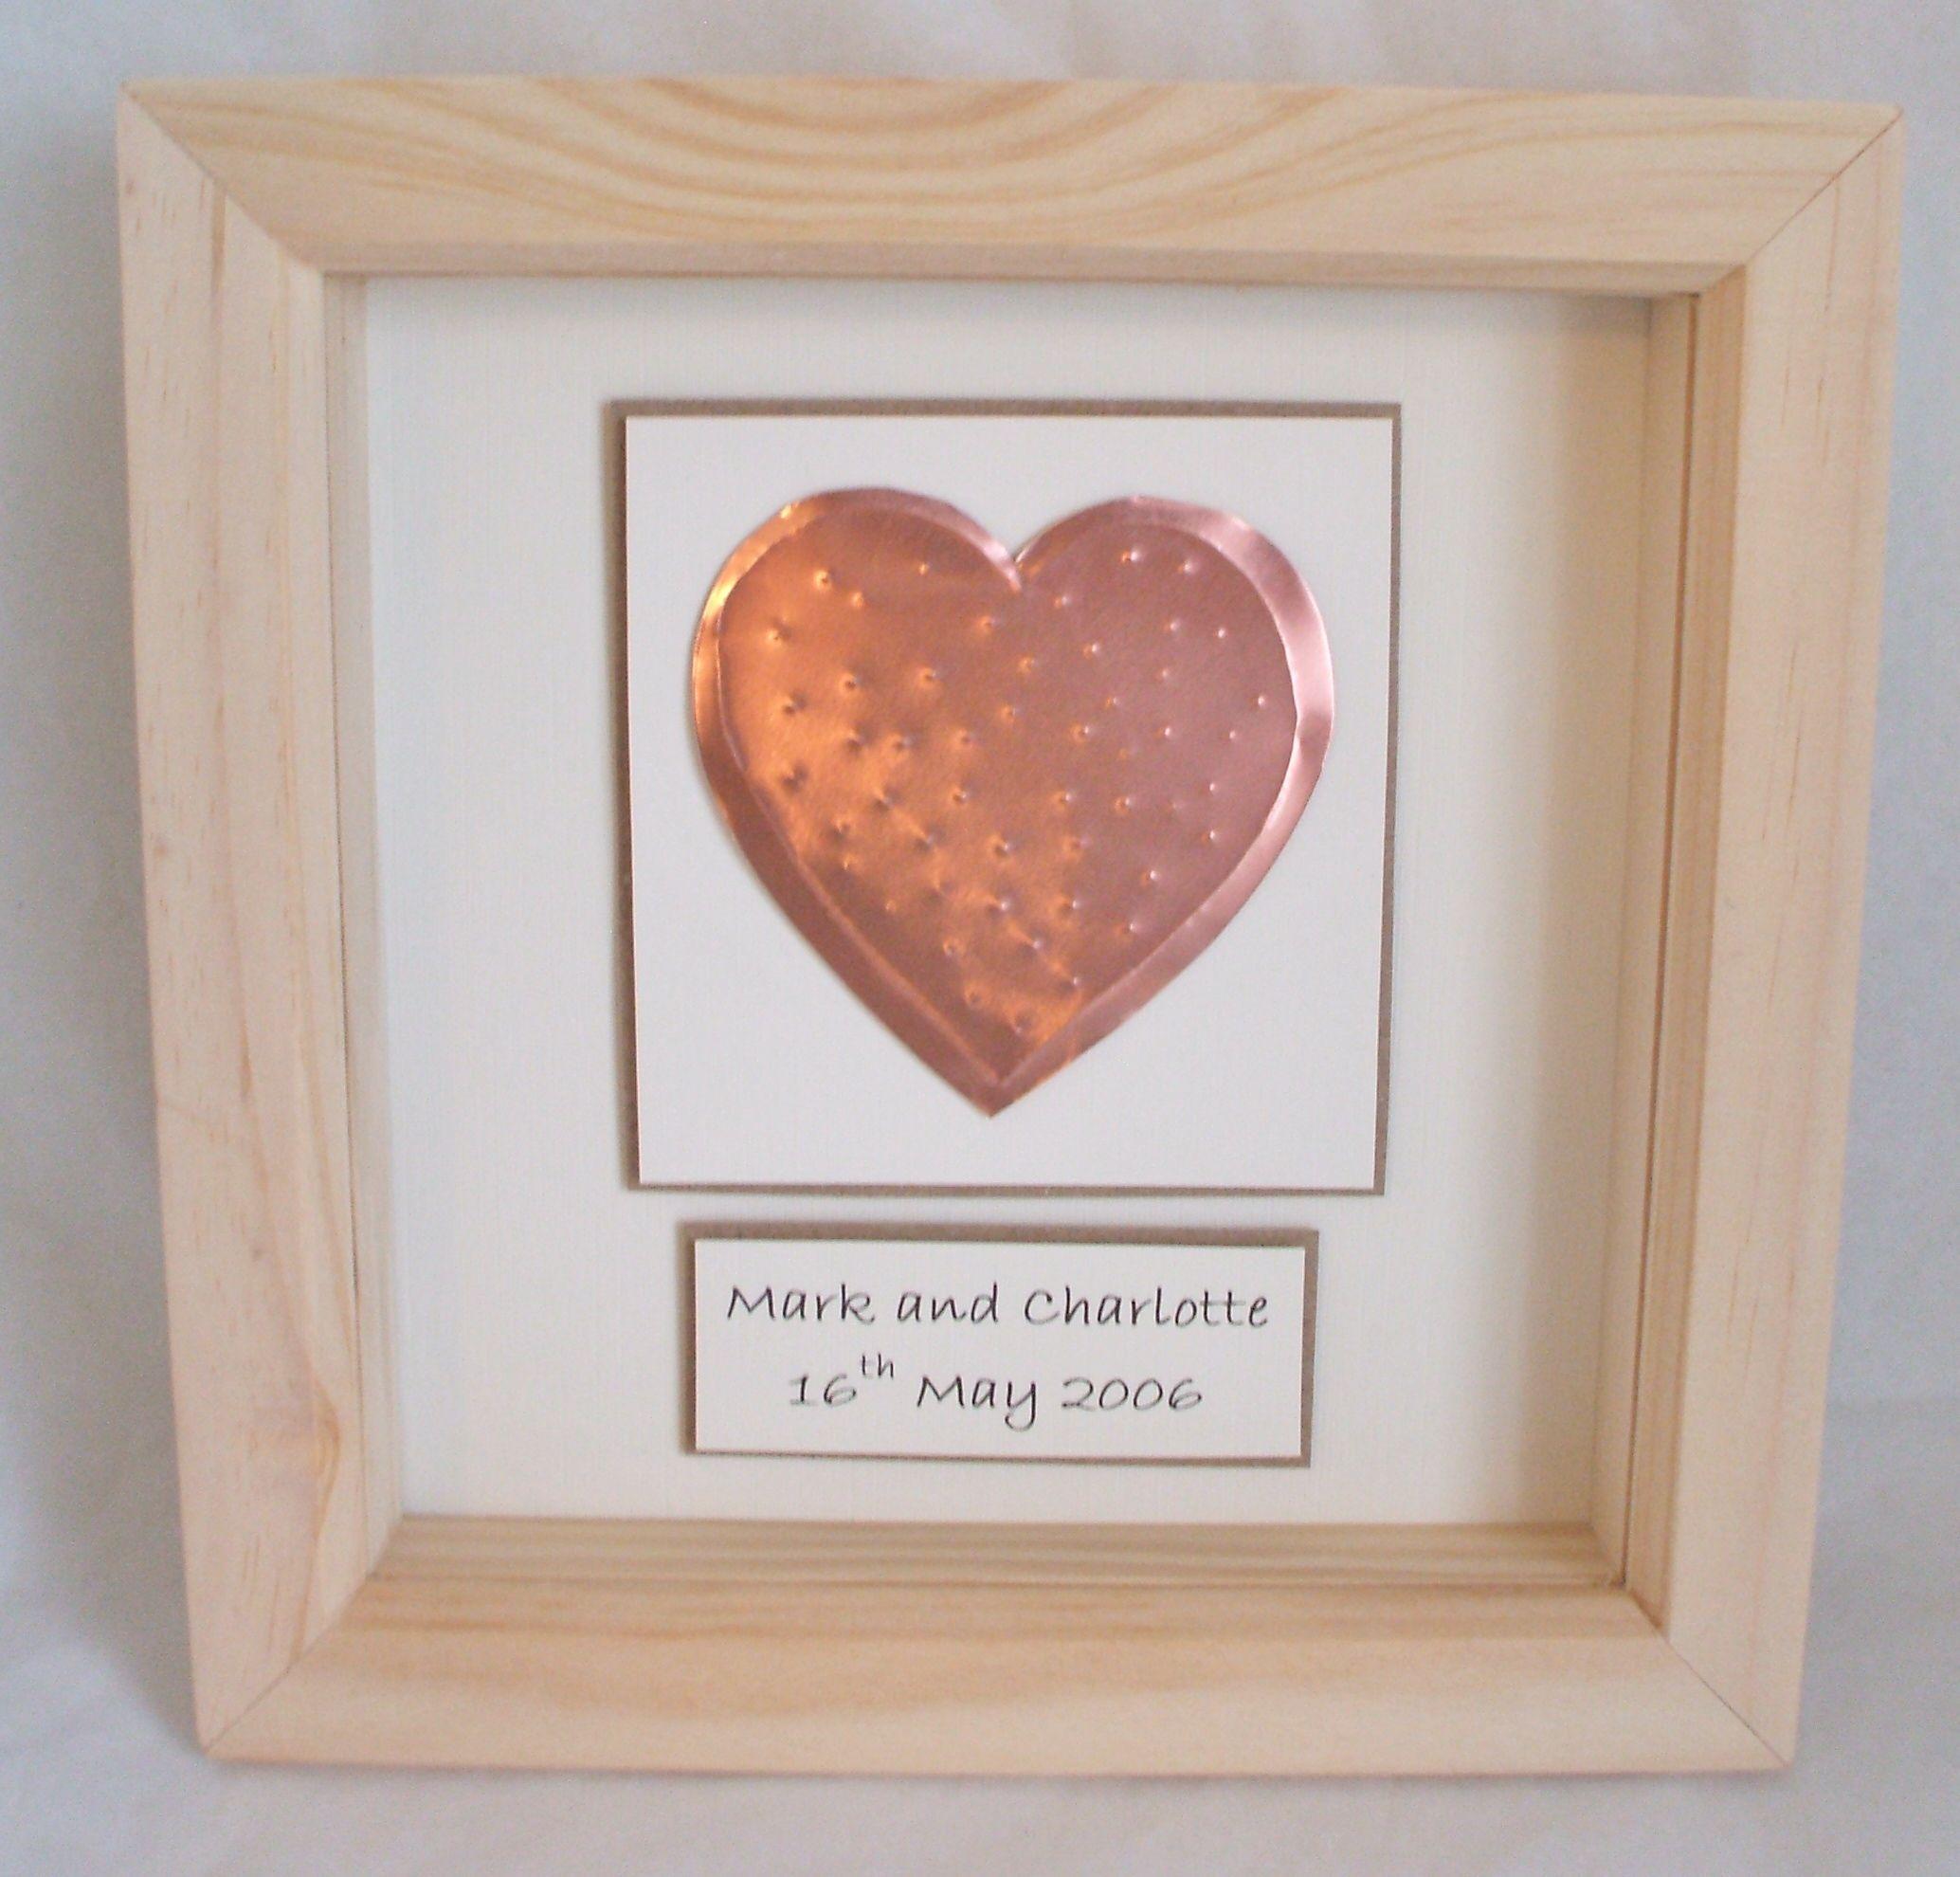 Beautiful 7th anniversary copper heartbox gift 7th